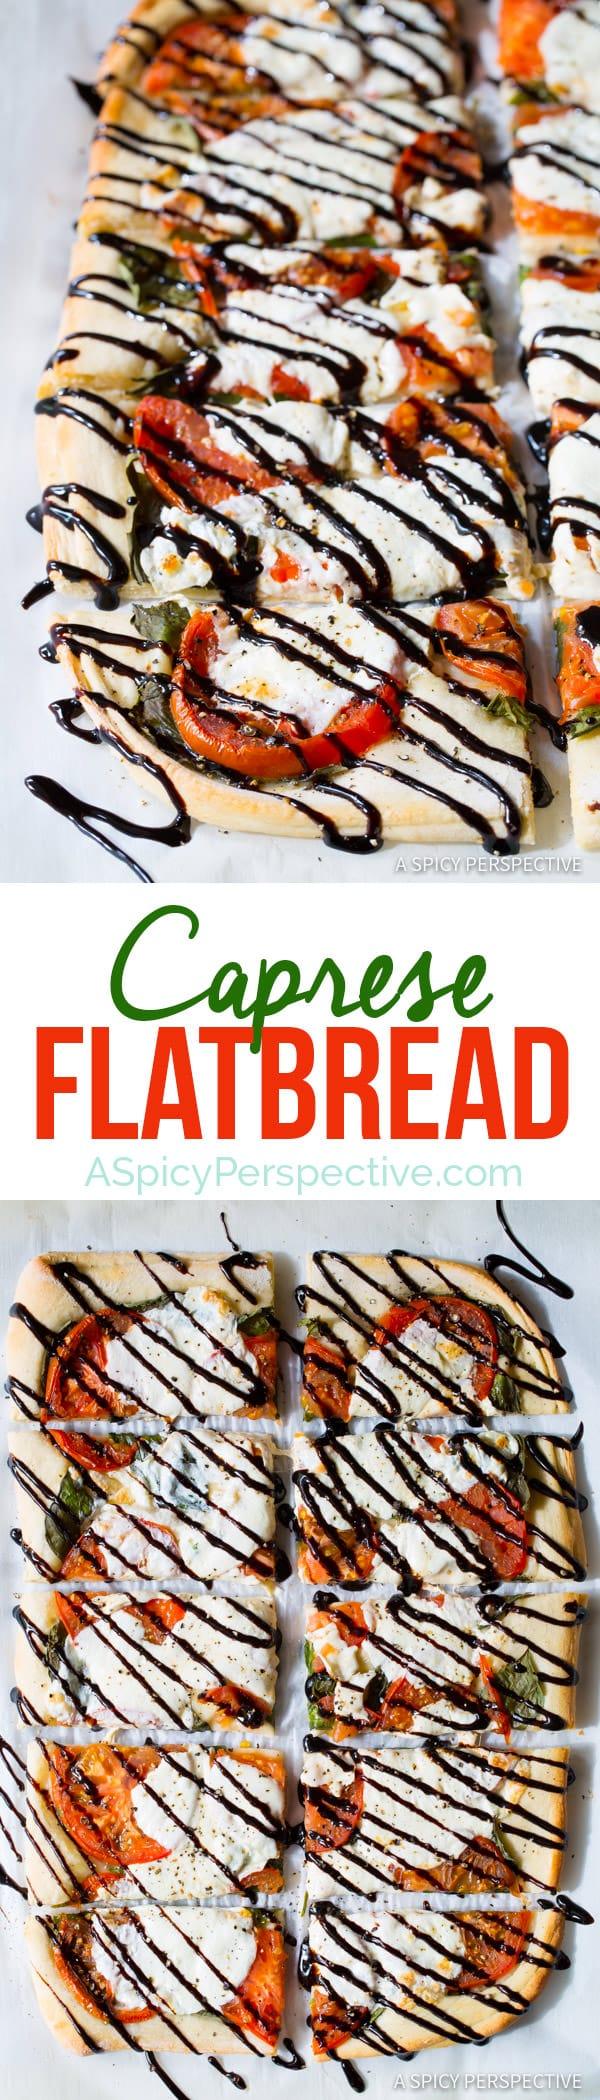 Fresh Caprese Flatbread Recipe | ASpicyPerspective.com